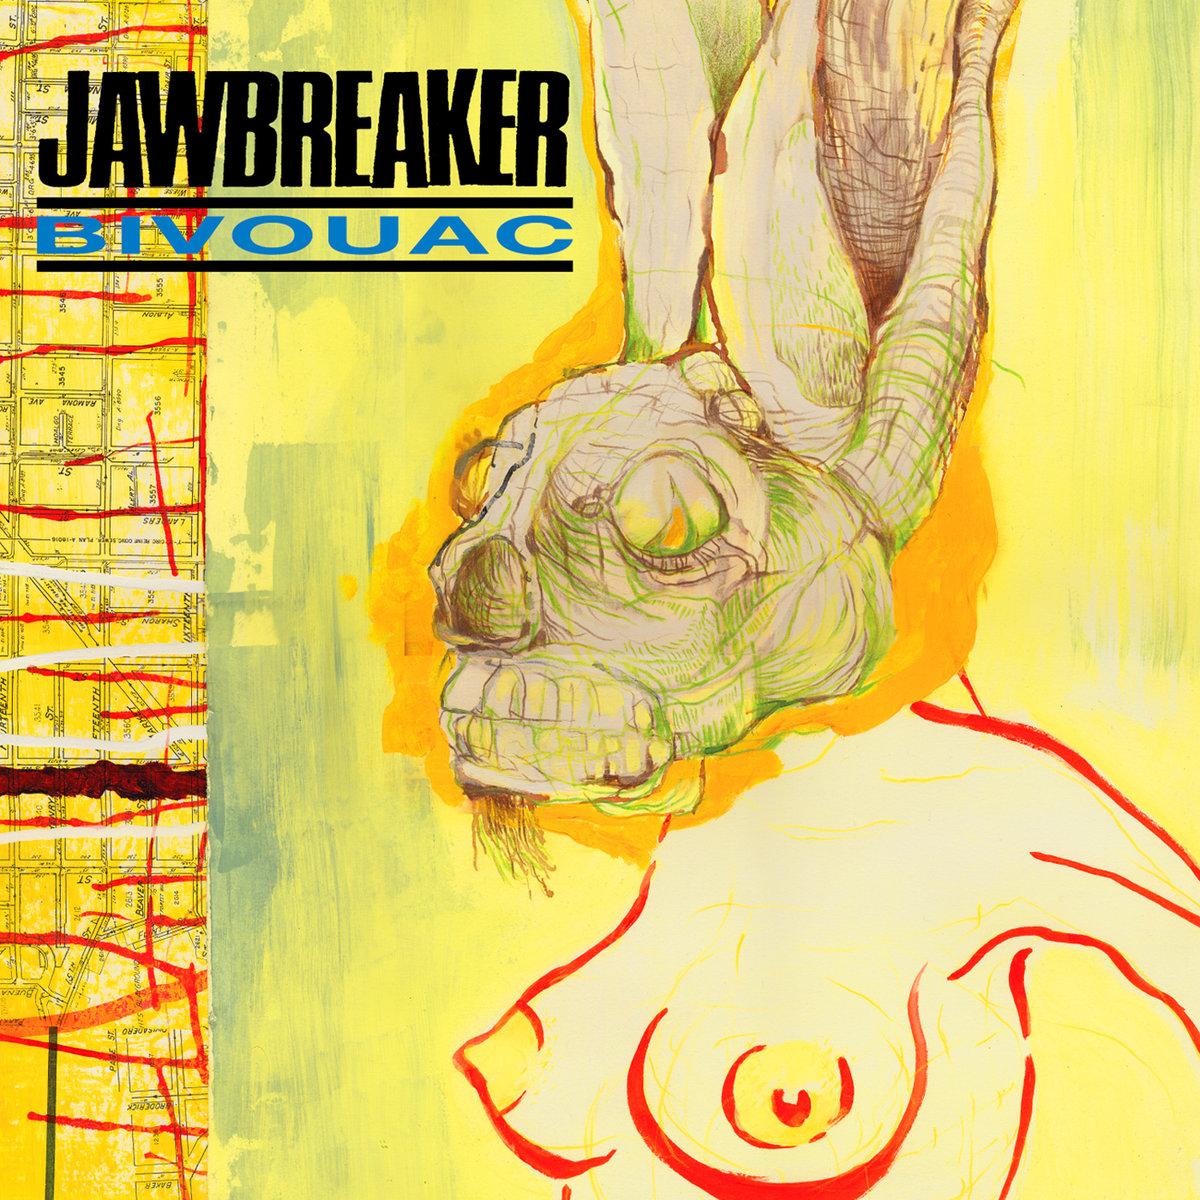 Jawbreaker - Bivouac LP